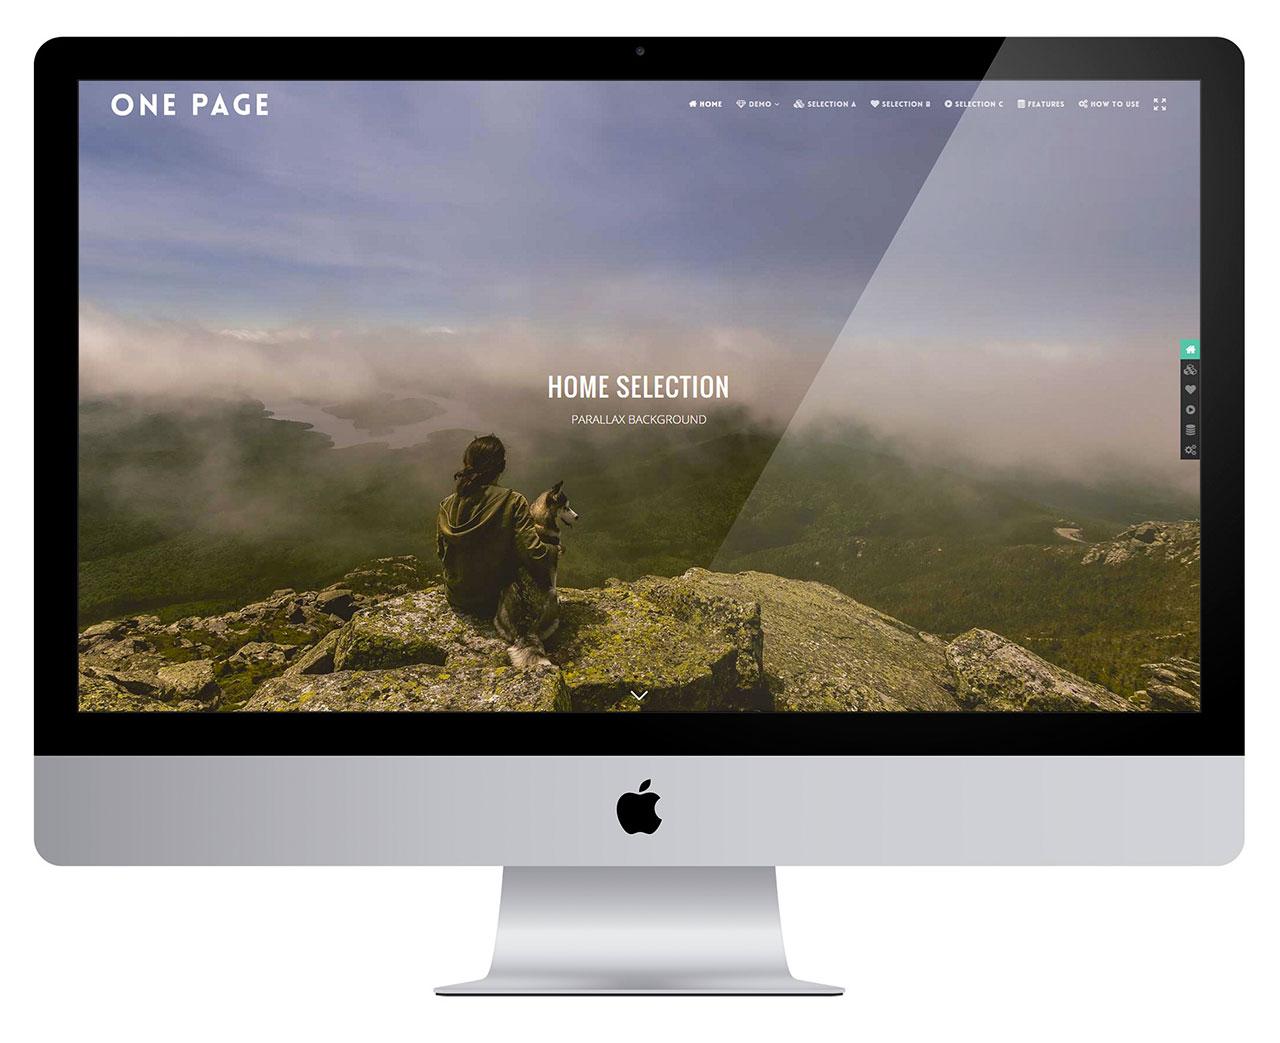 Smart One Page Navigation — Addon For Visual Composer